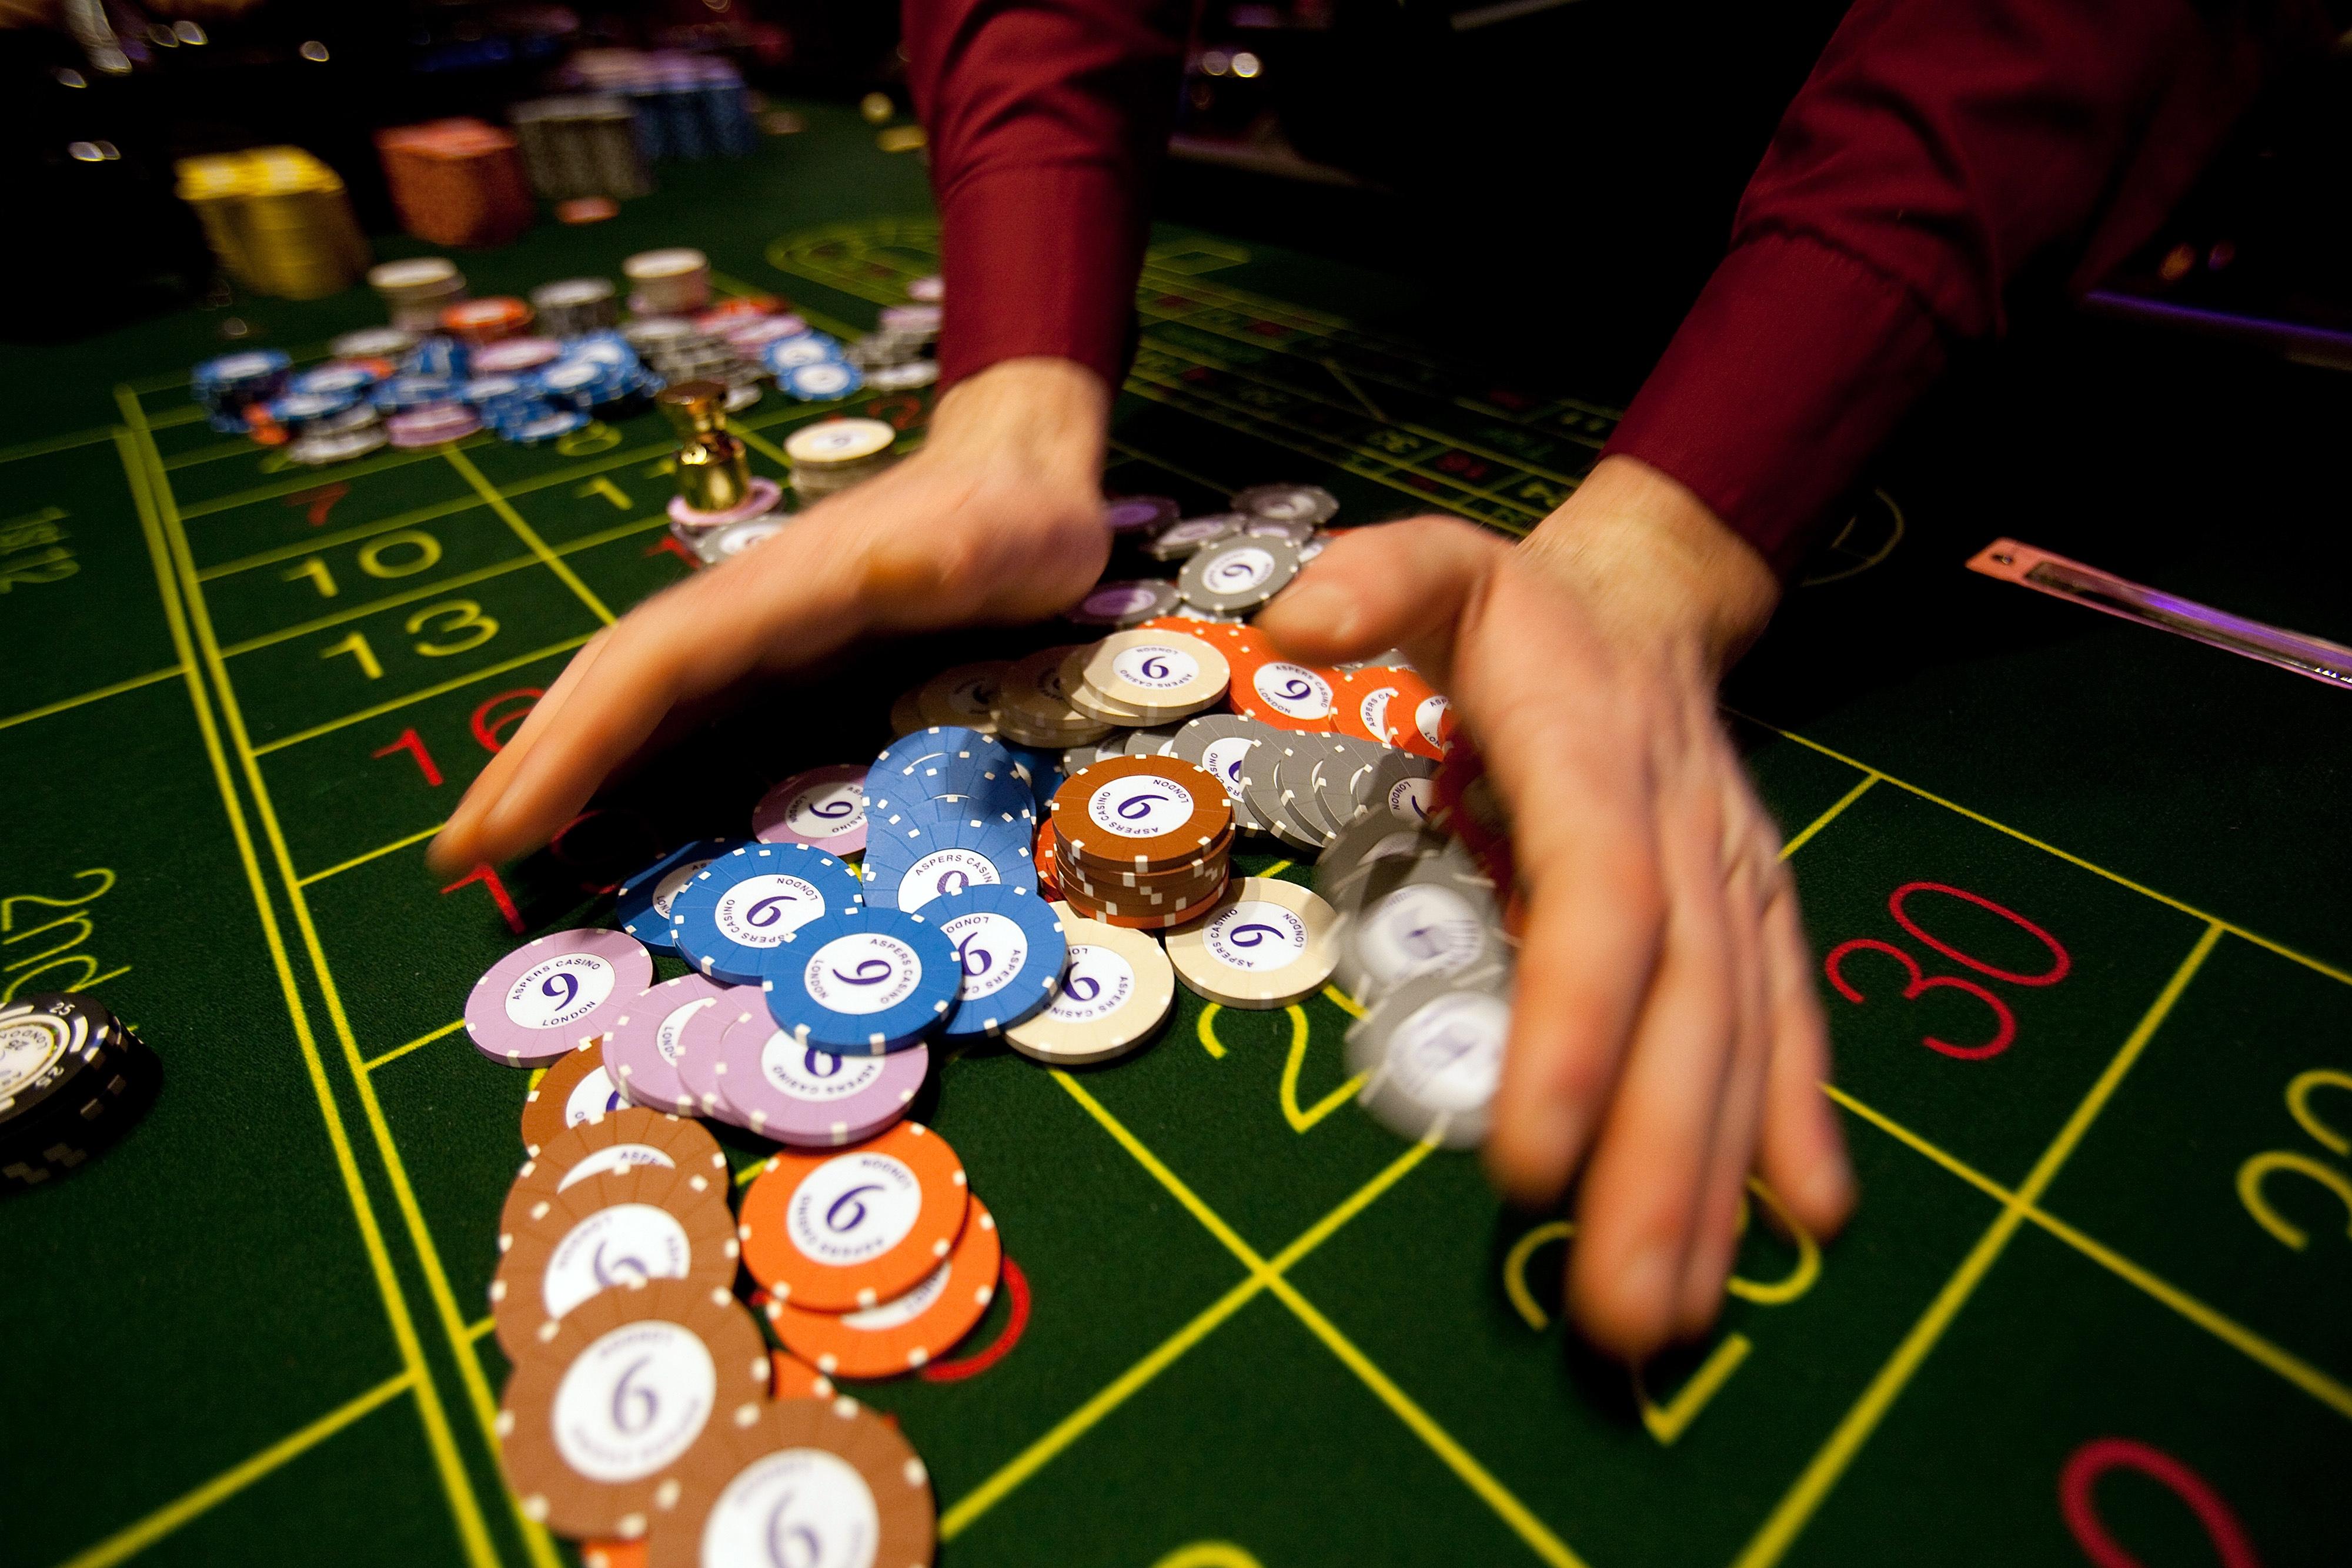 Inside Aspers Casino at Westfield Stratford City Mall